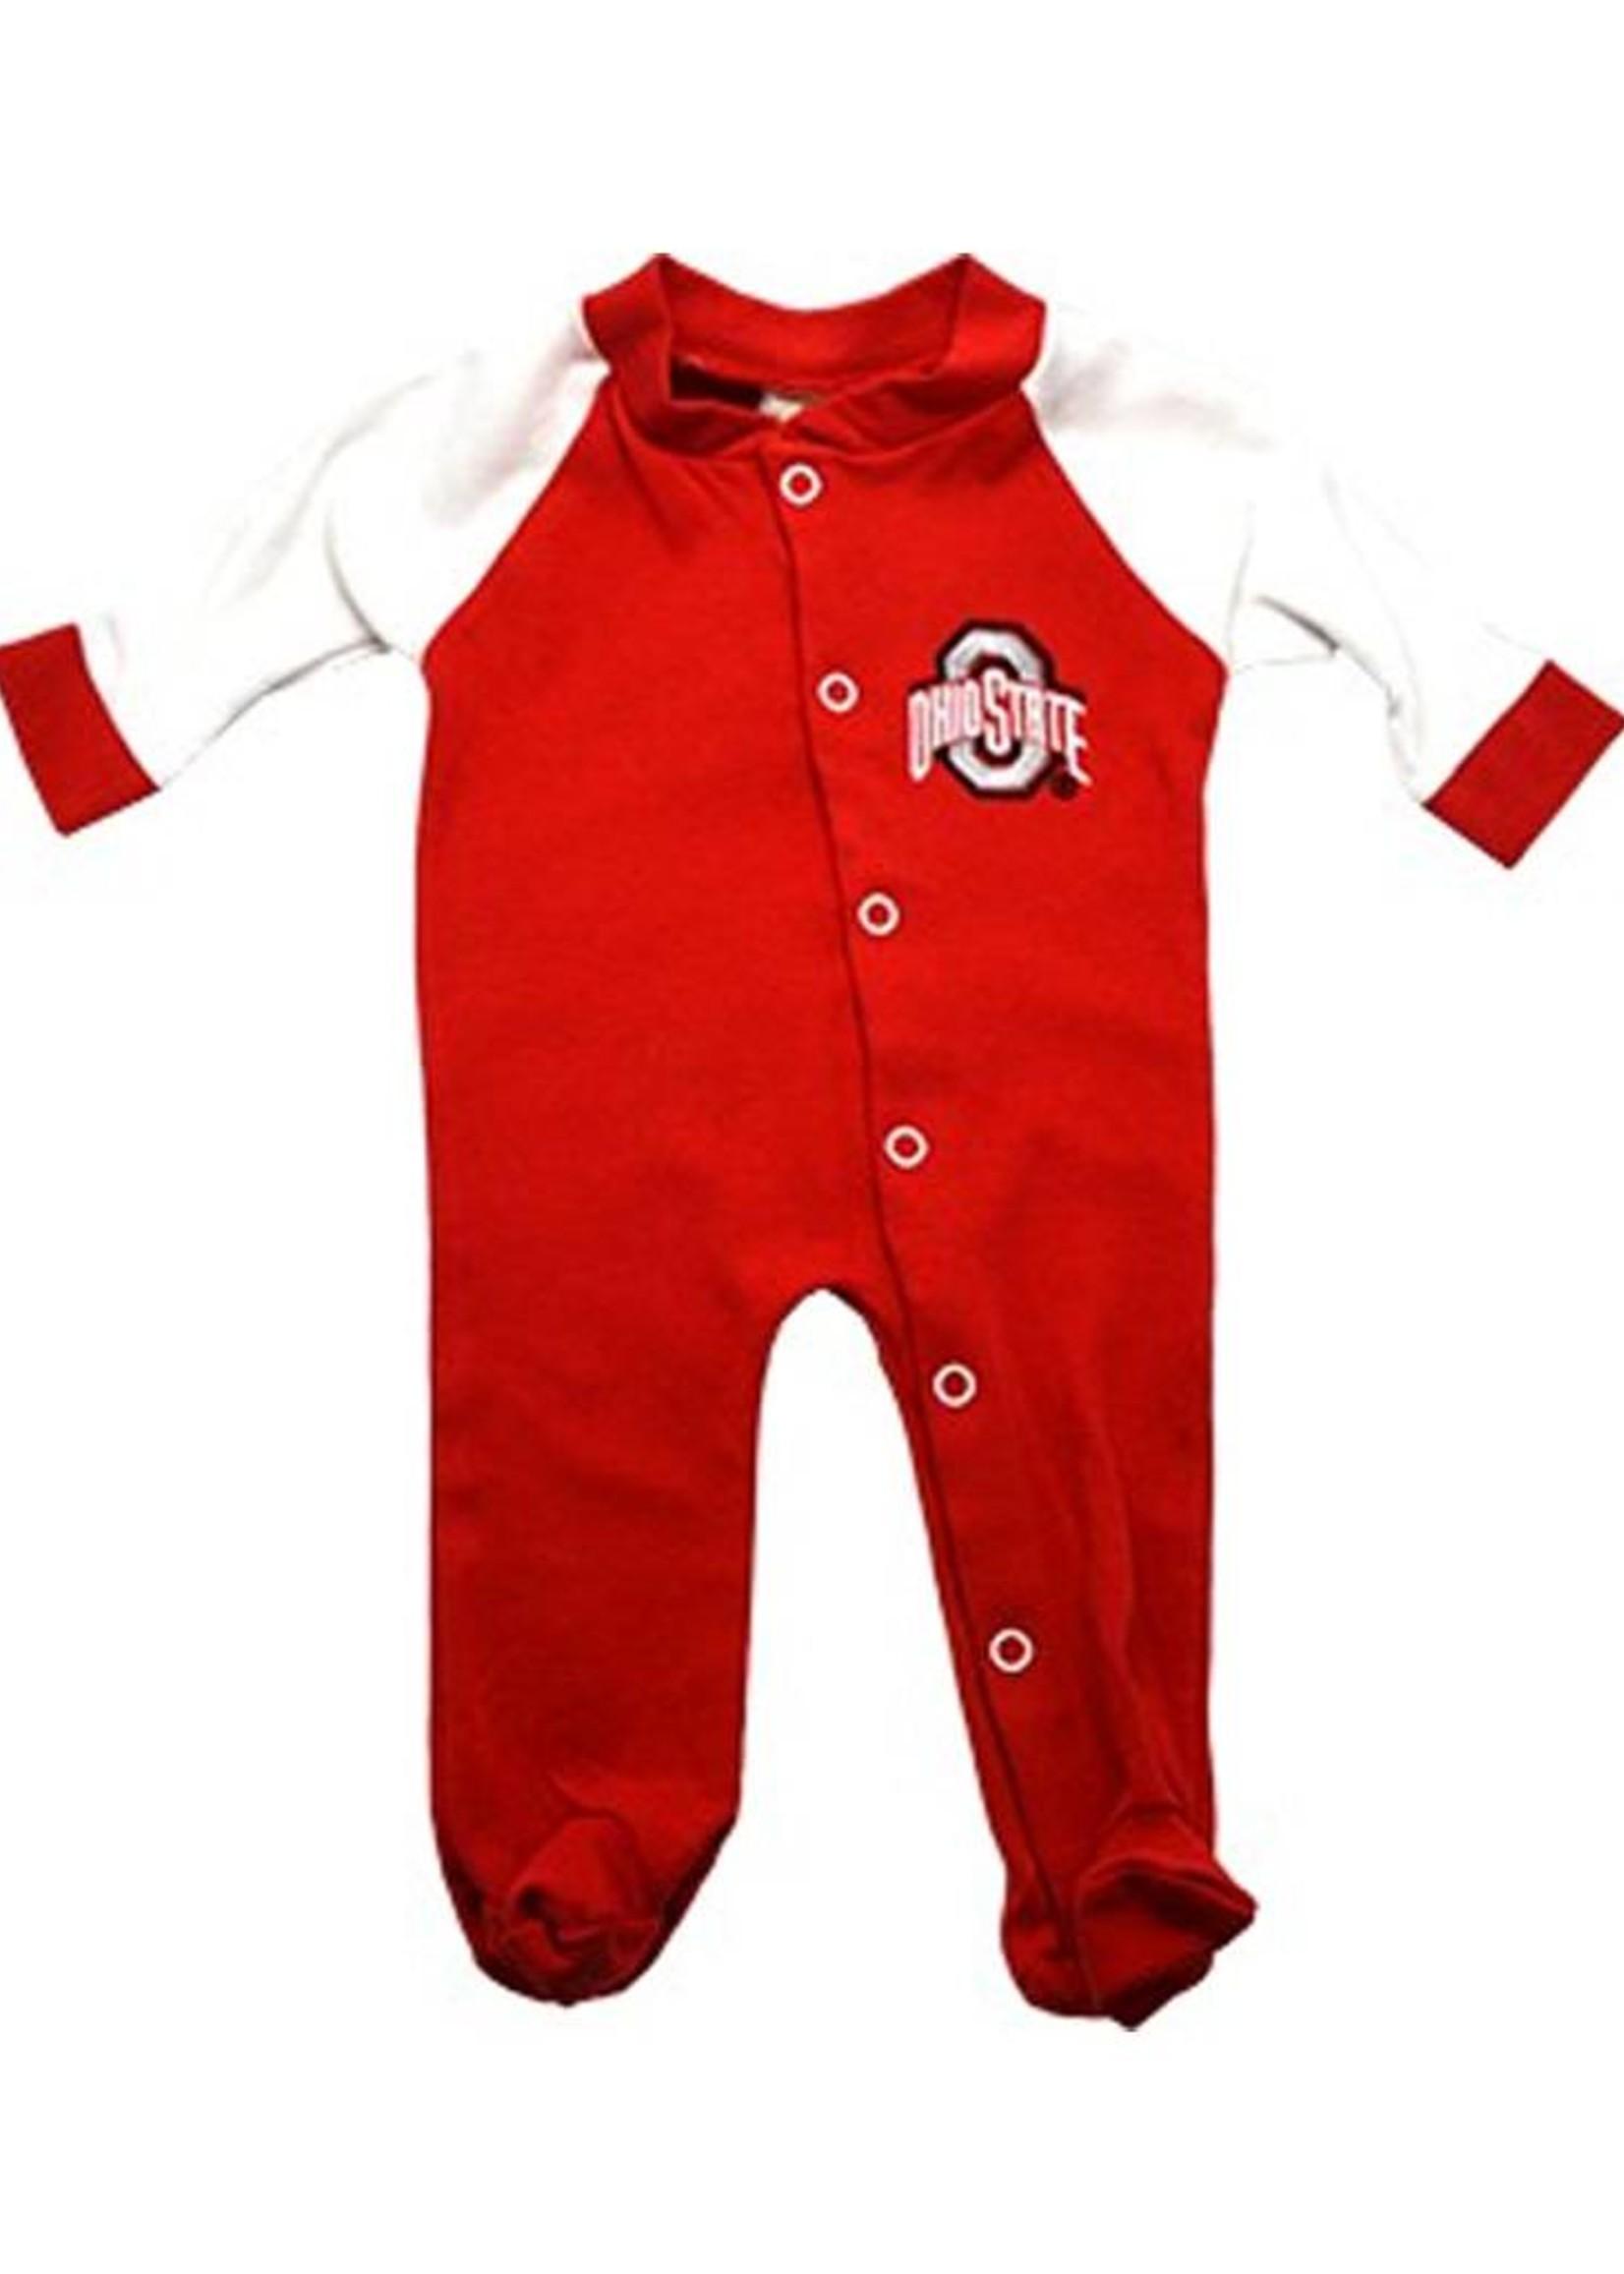 Ohio State University Footed Sleeper